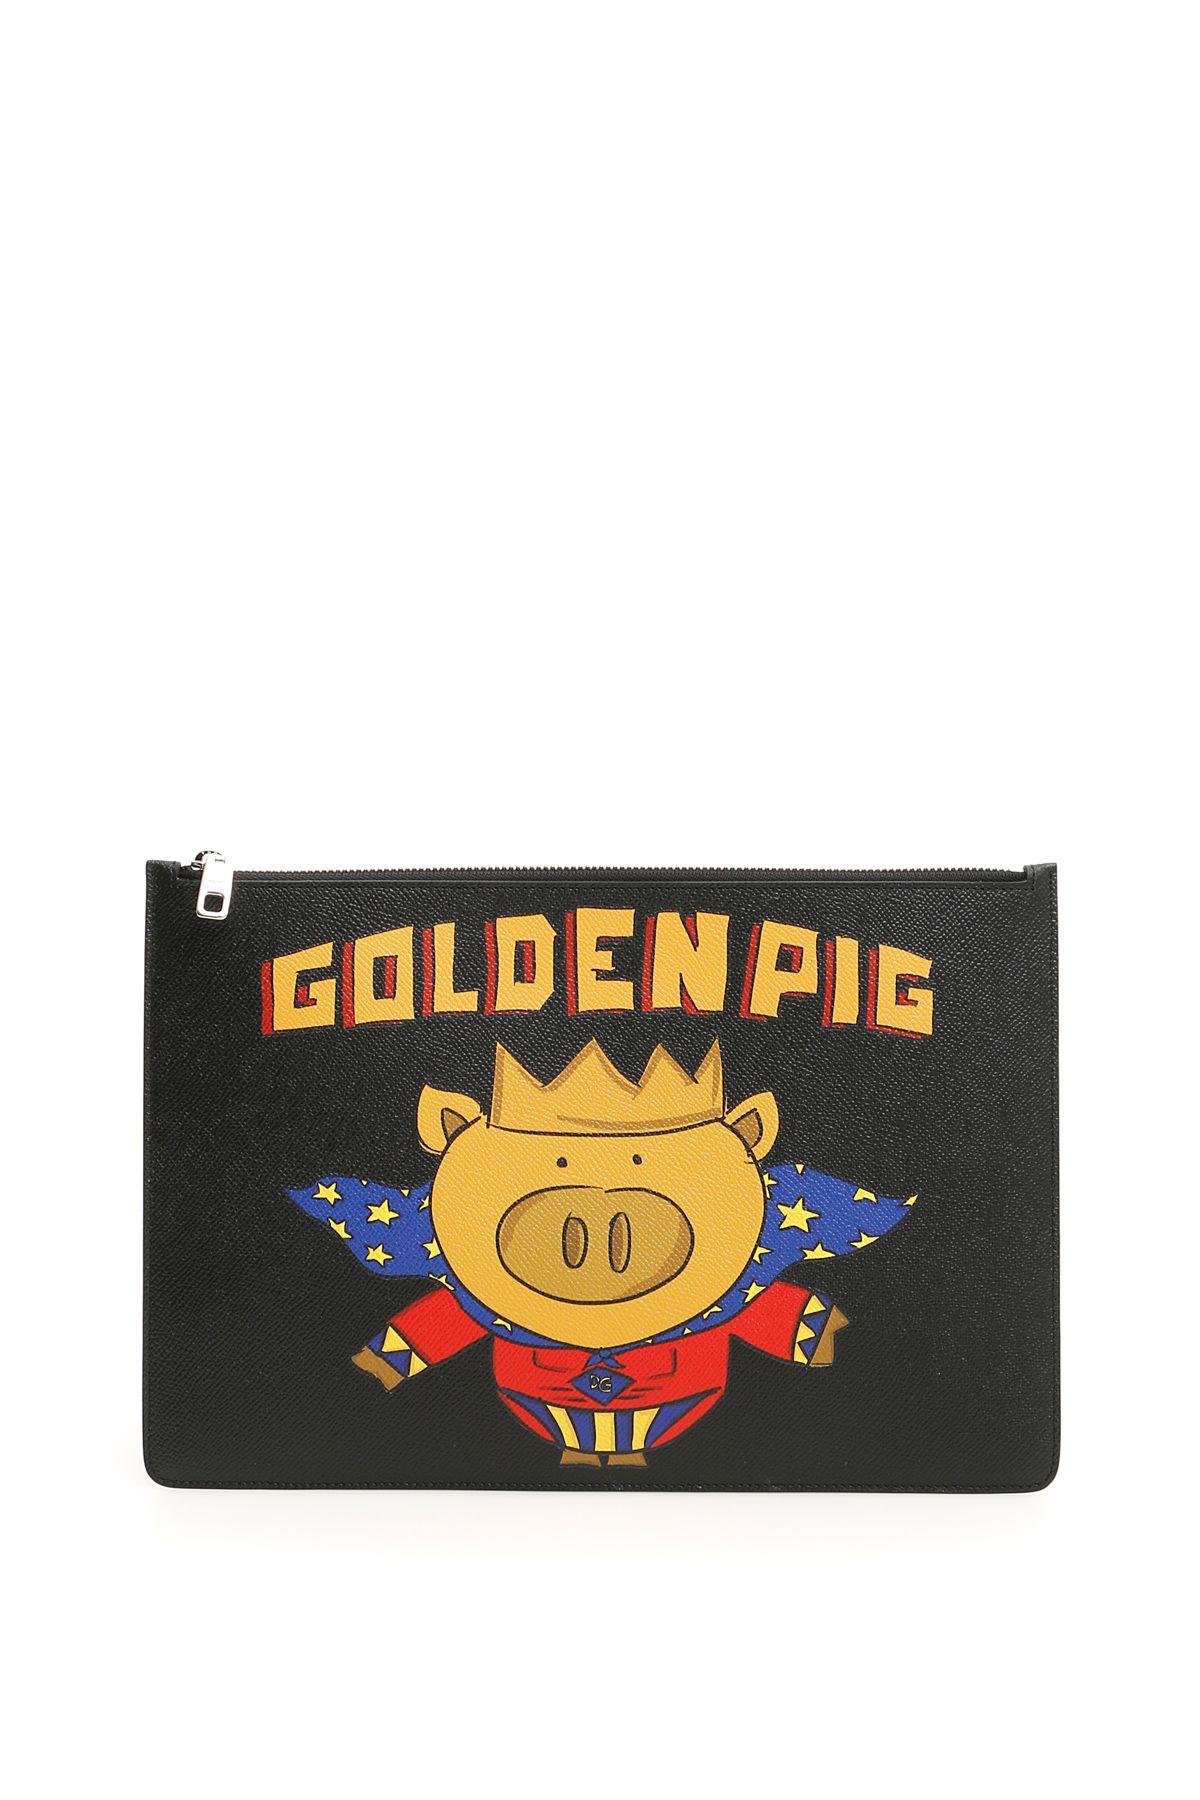 Dolce & Gabbana Golden Pig Document Holder